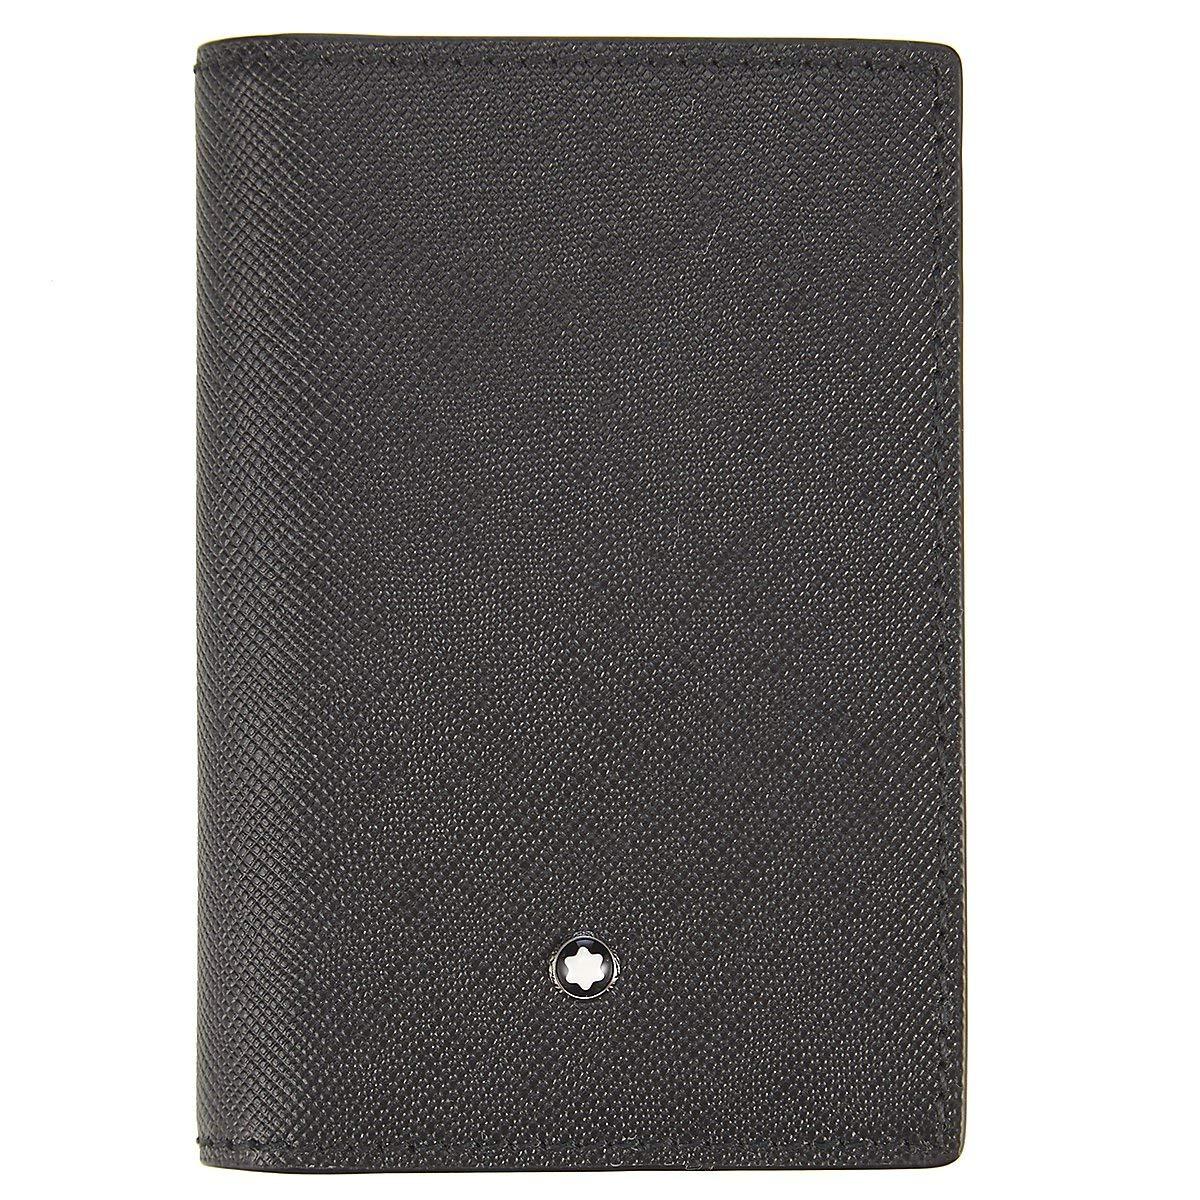 Montblanc Sartorial Men's Medium Leather Business Card Holder 113223